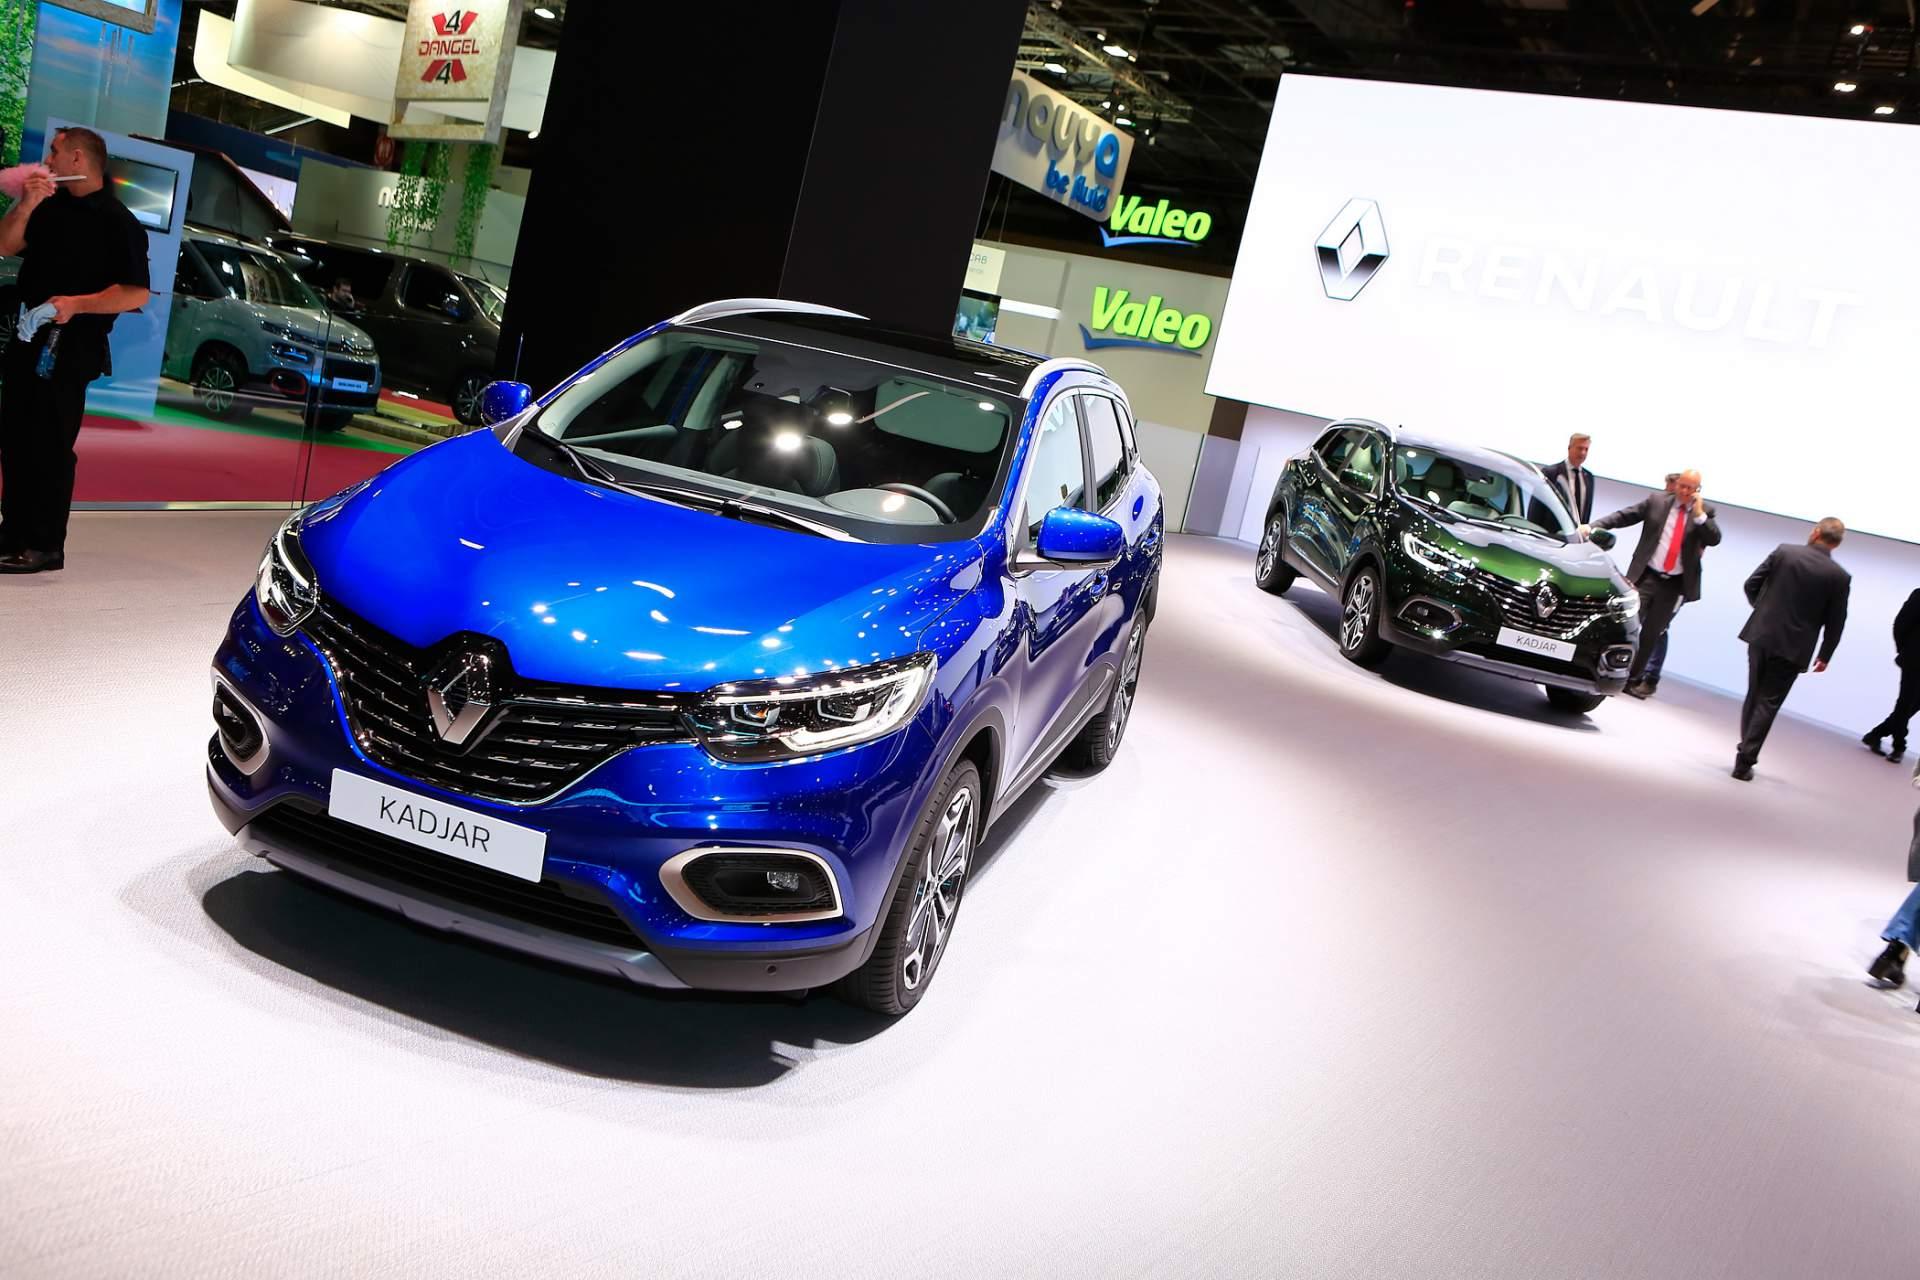 2018 Paris Motor Show: Renault Kadjar (рестилизација)